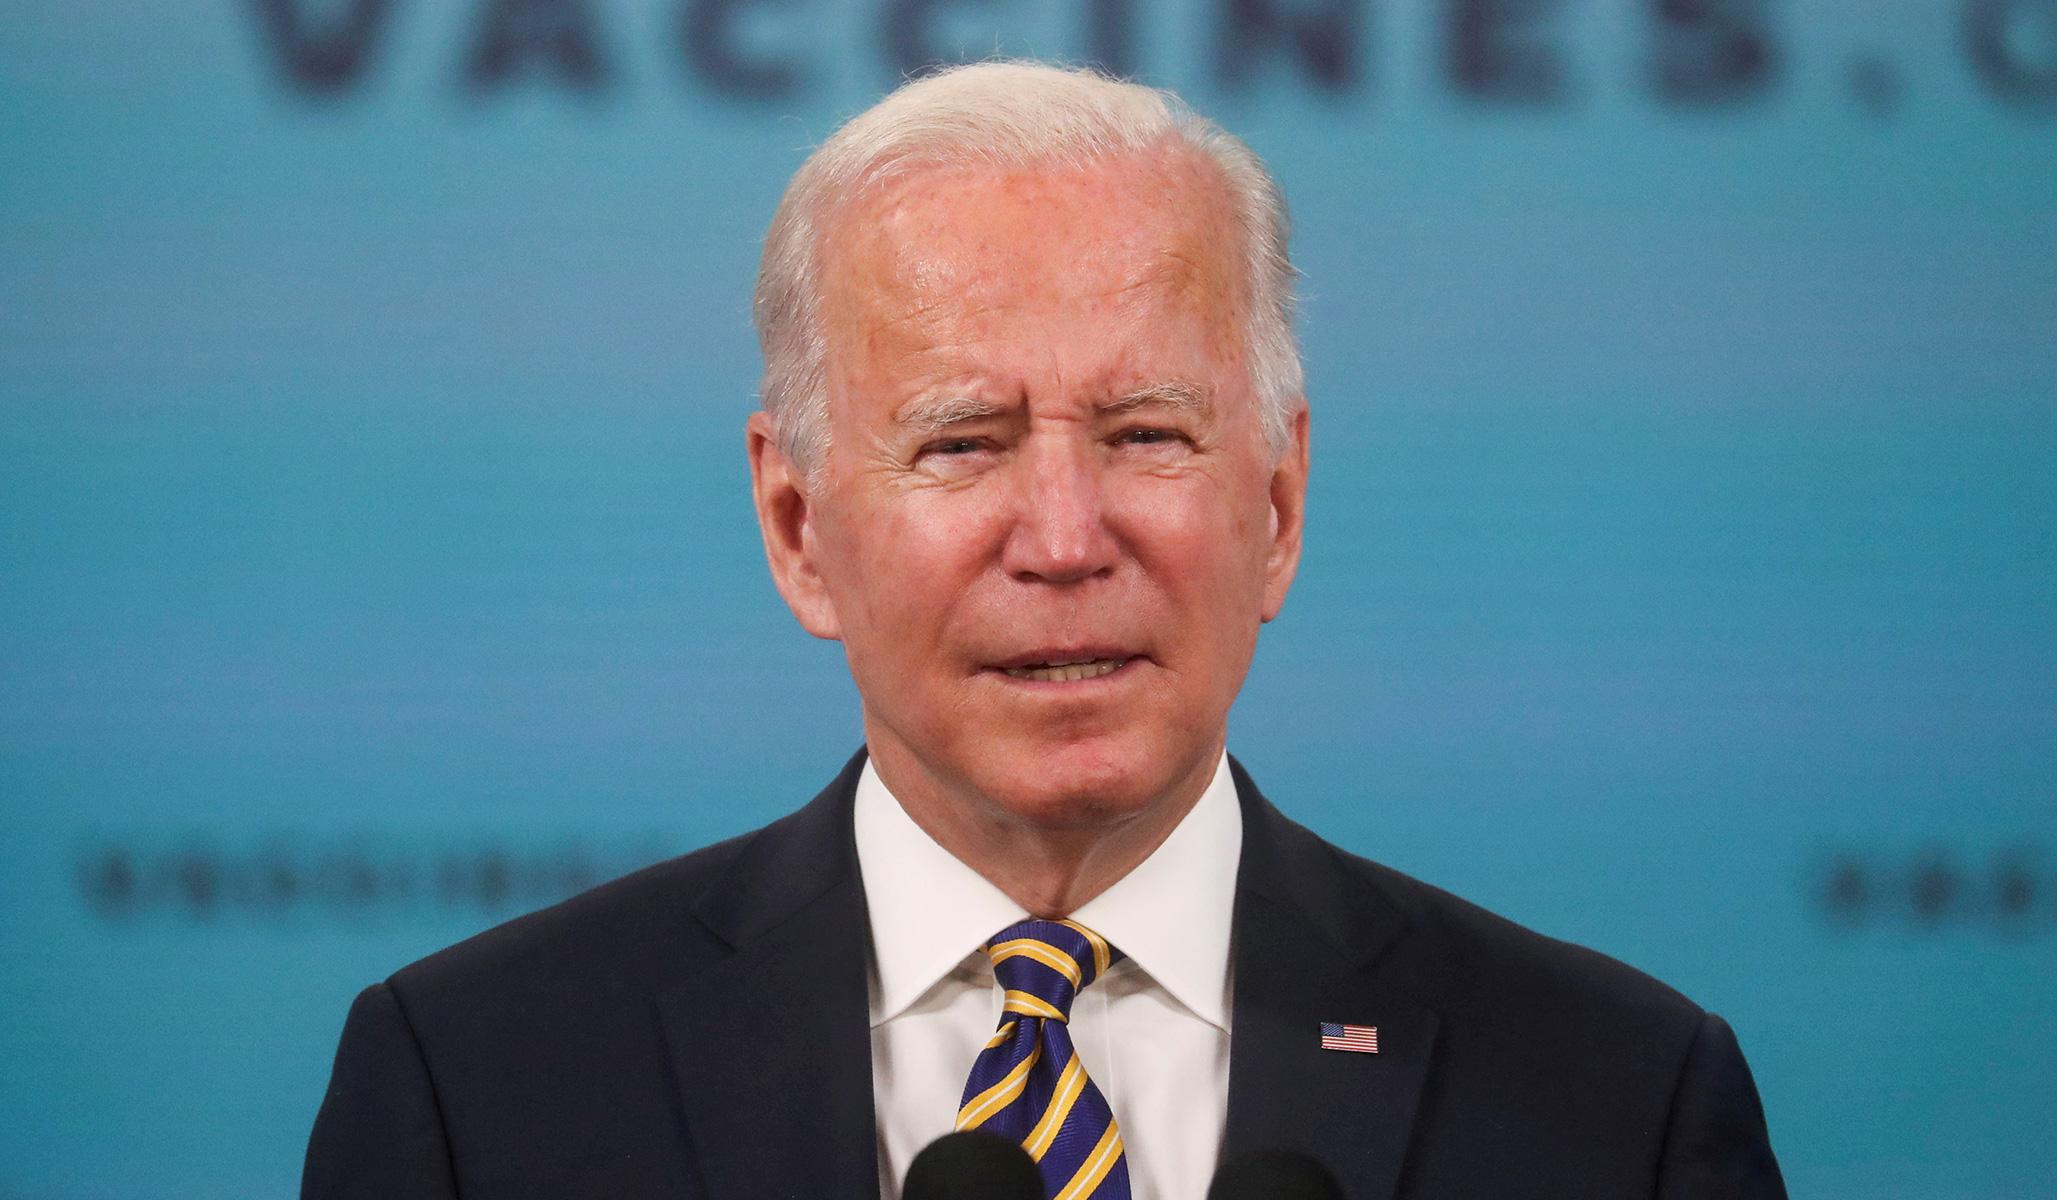 Joe Biden: Presiden yang Tidak Ada